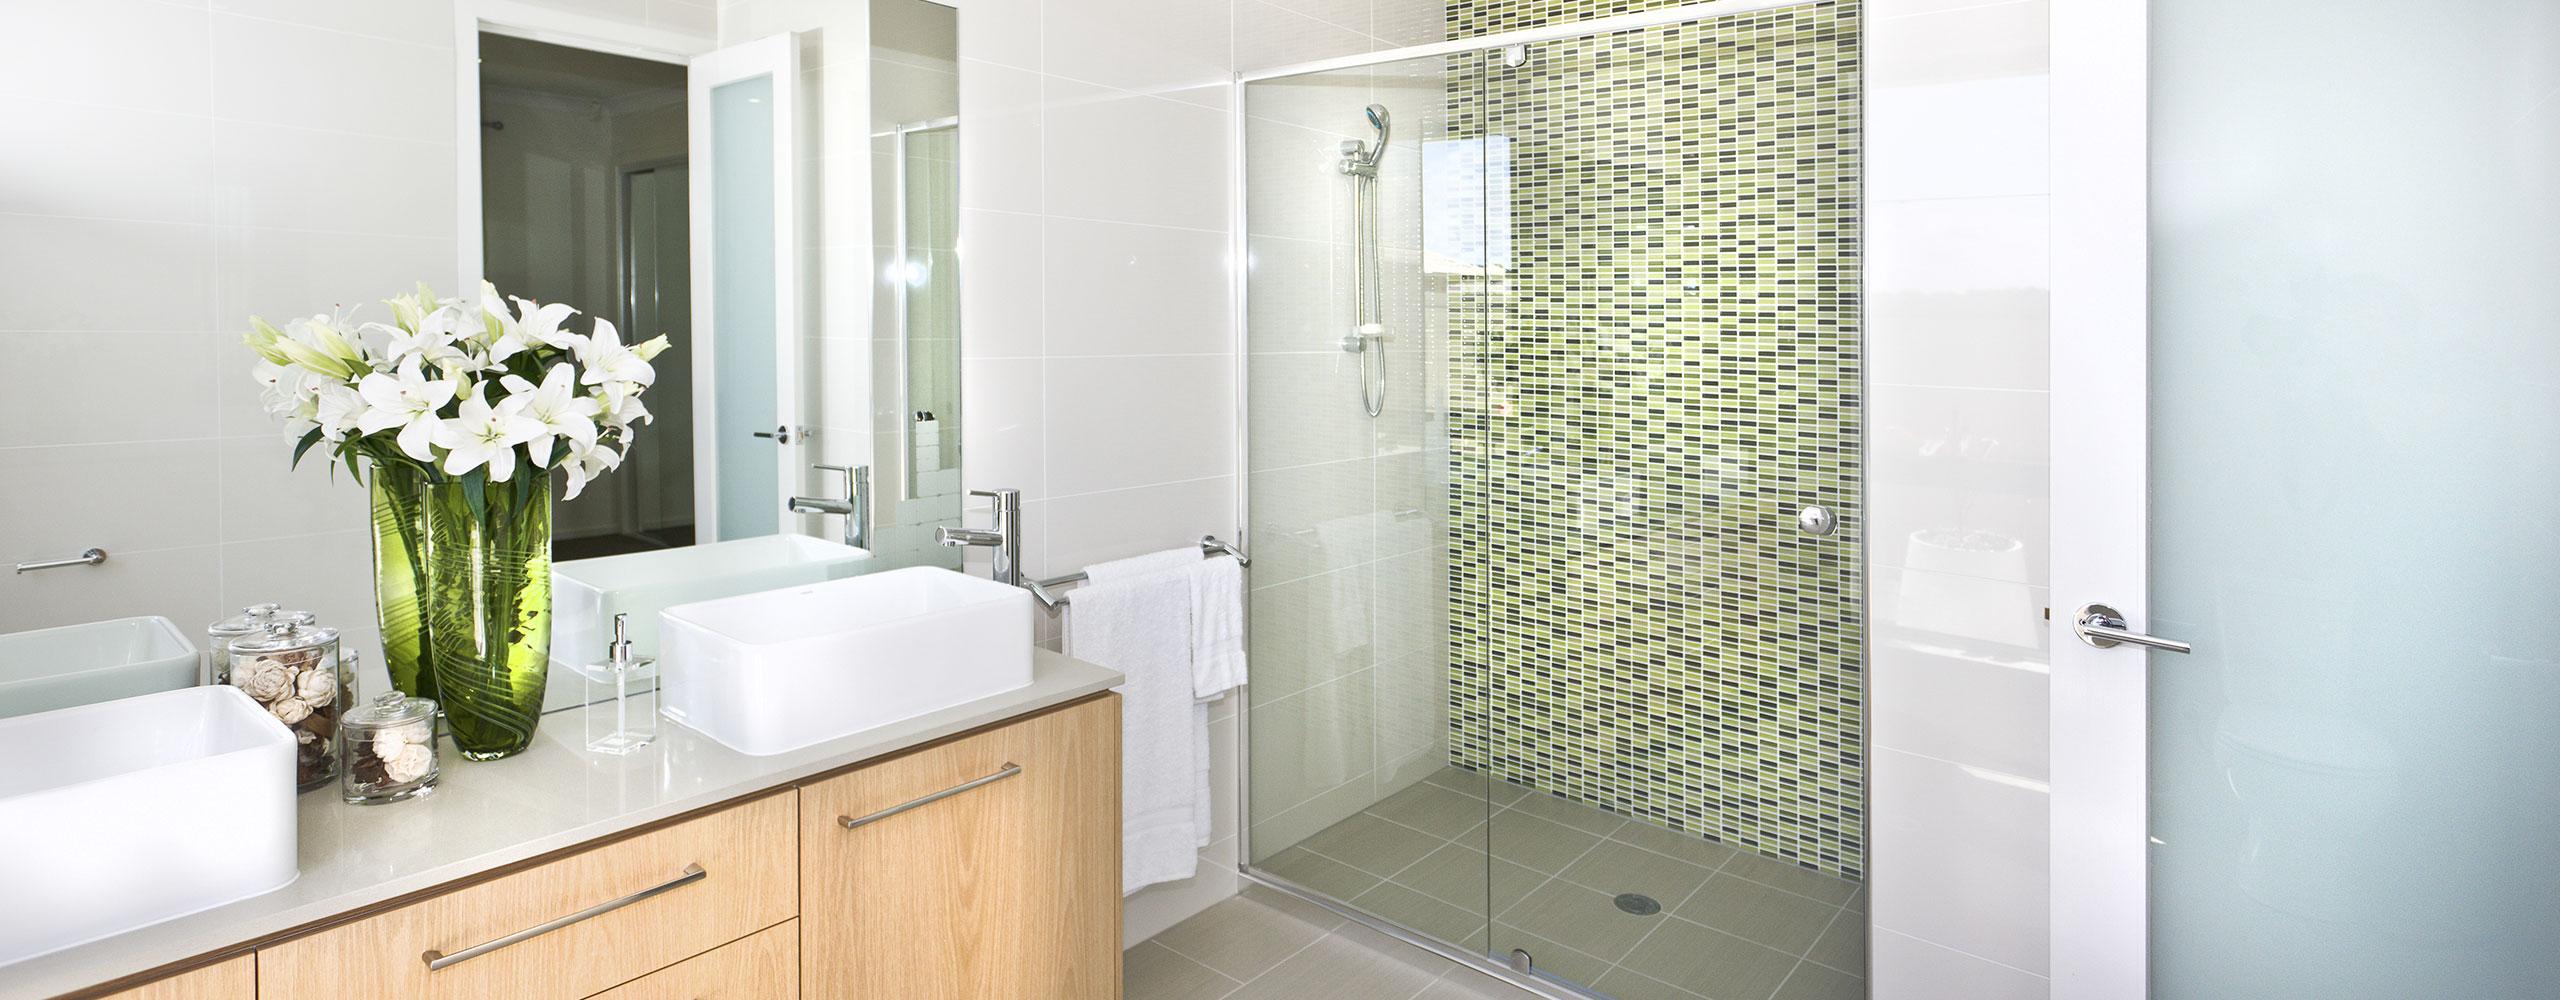 https://www.plompinstallatietechniek.nl/files/thumbnails/tabafbeeldingen-plomp-installatitechniek-sanitair-2.2560x1000.jpg